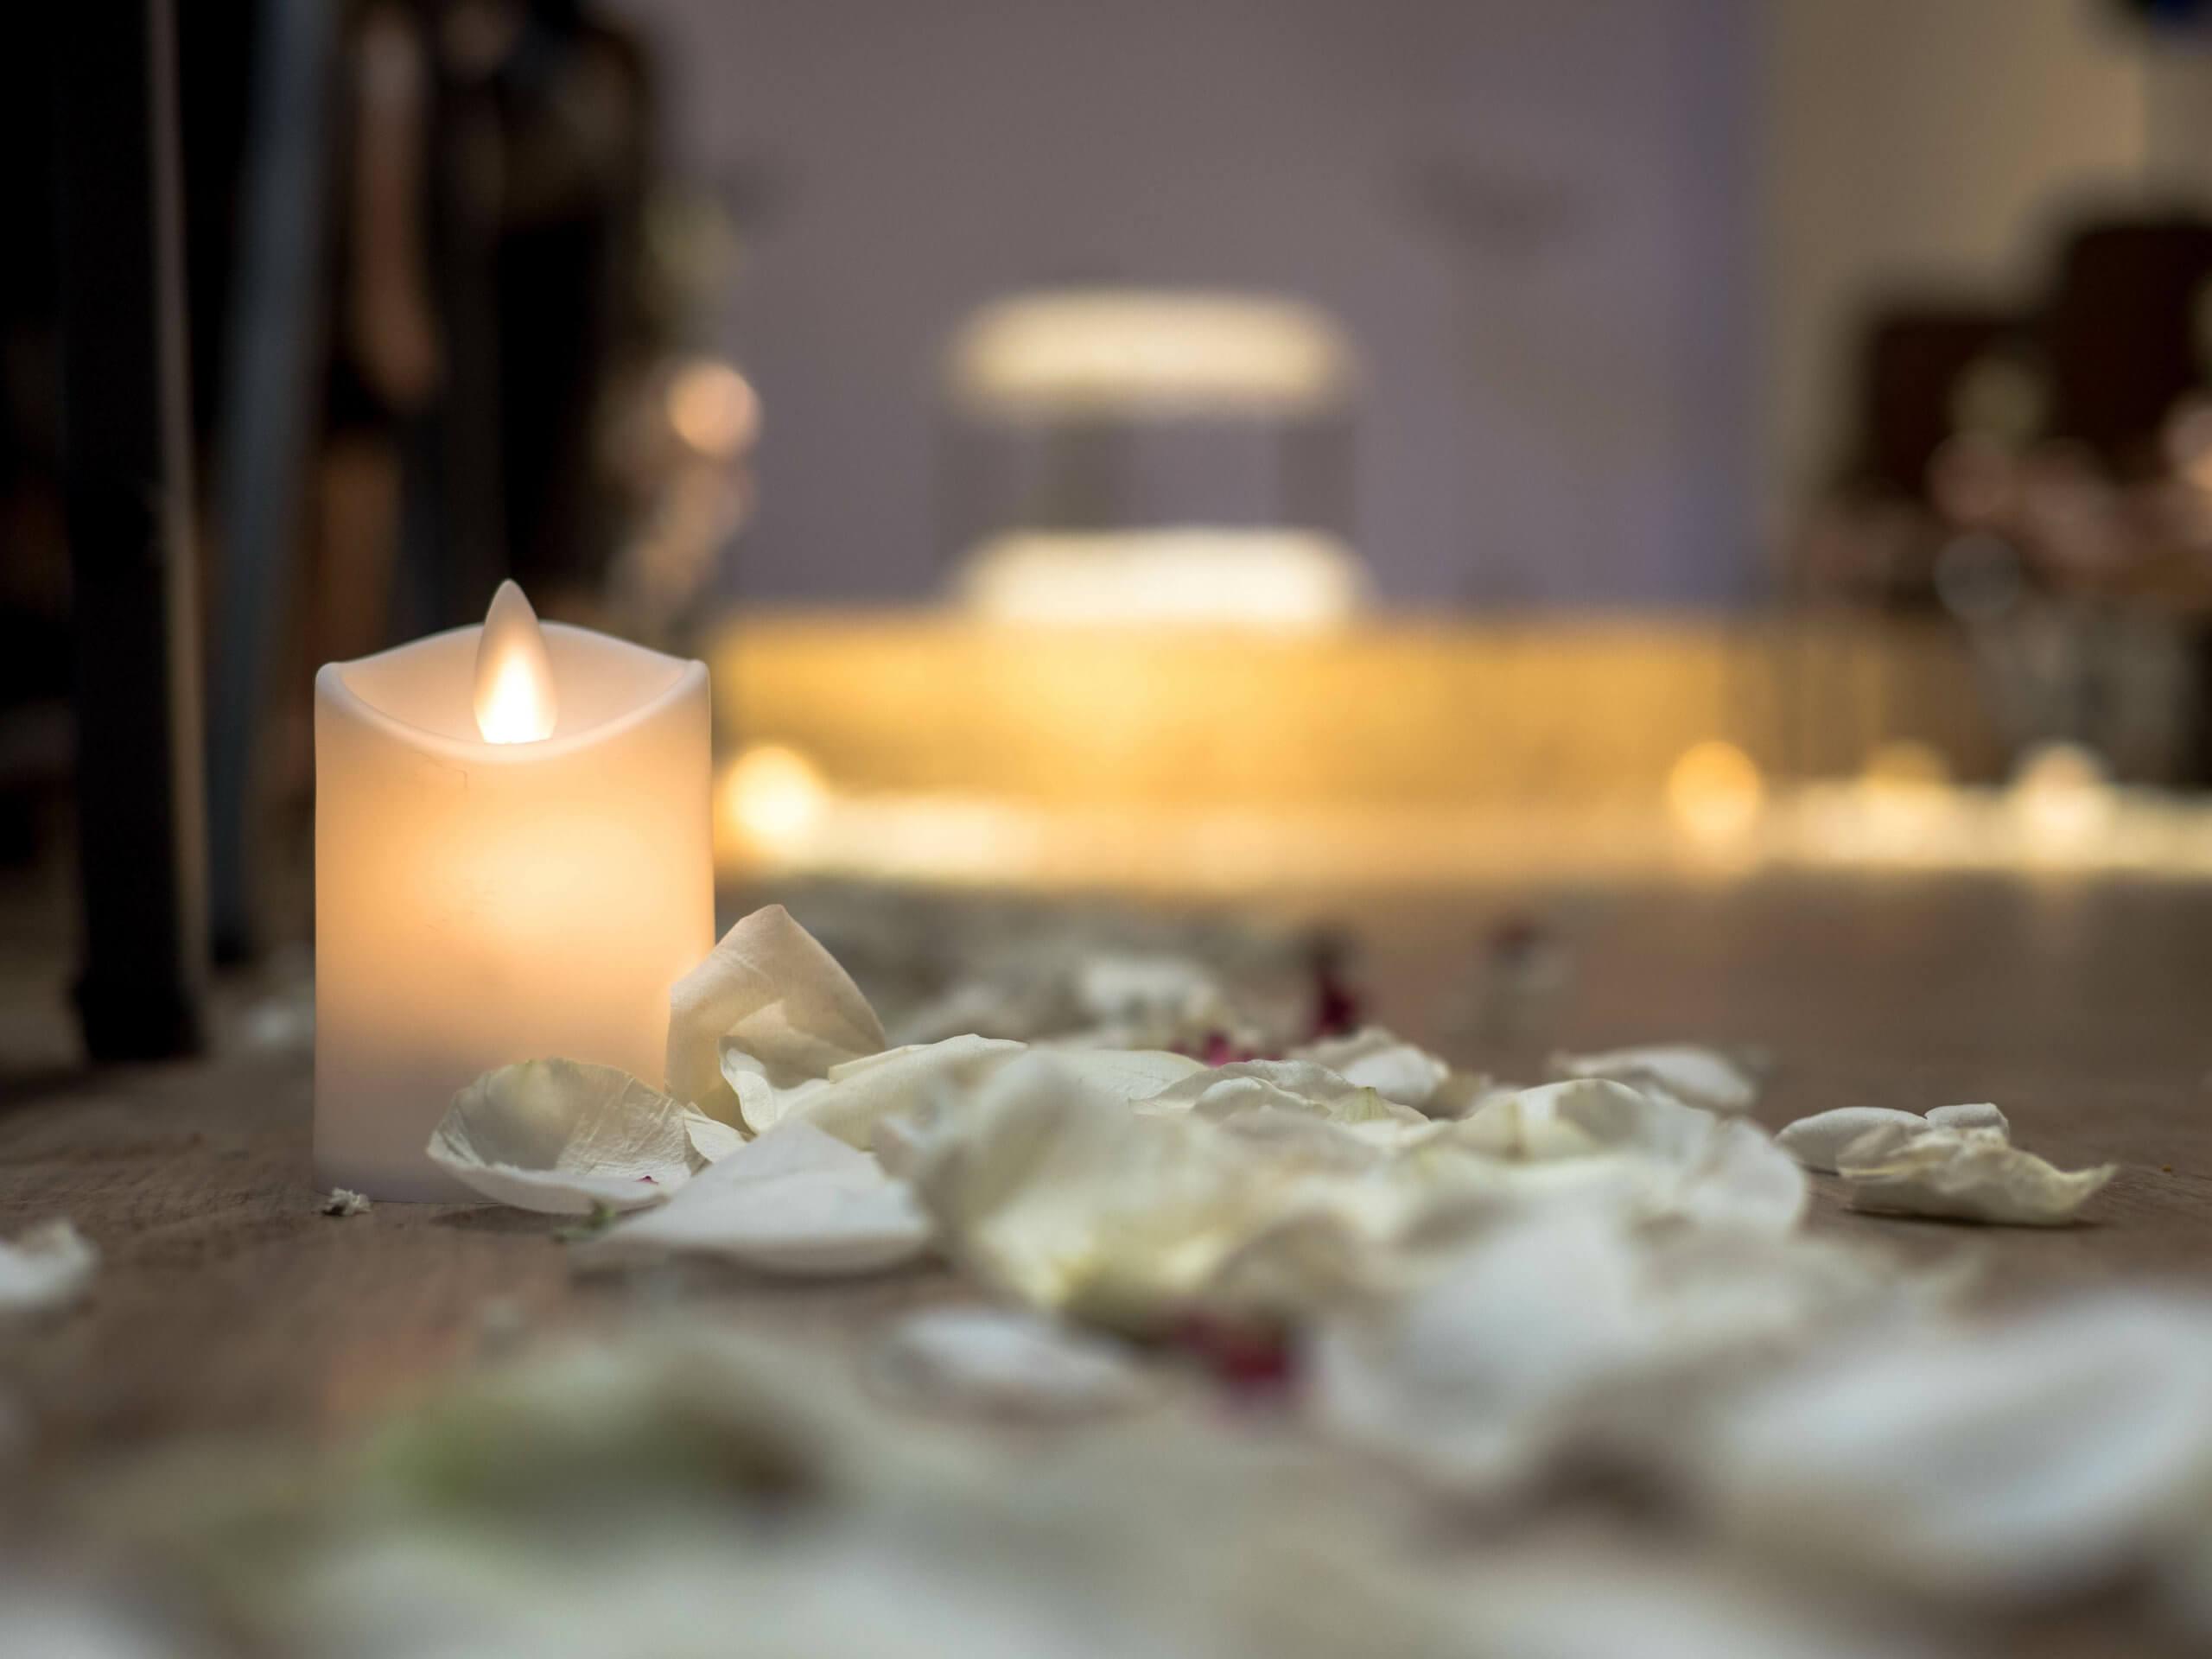 intimacy retreats intimacy workshops intimacy retreats for couples